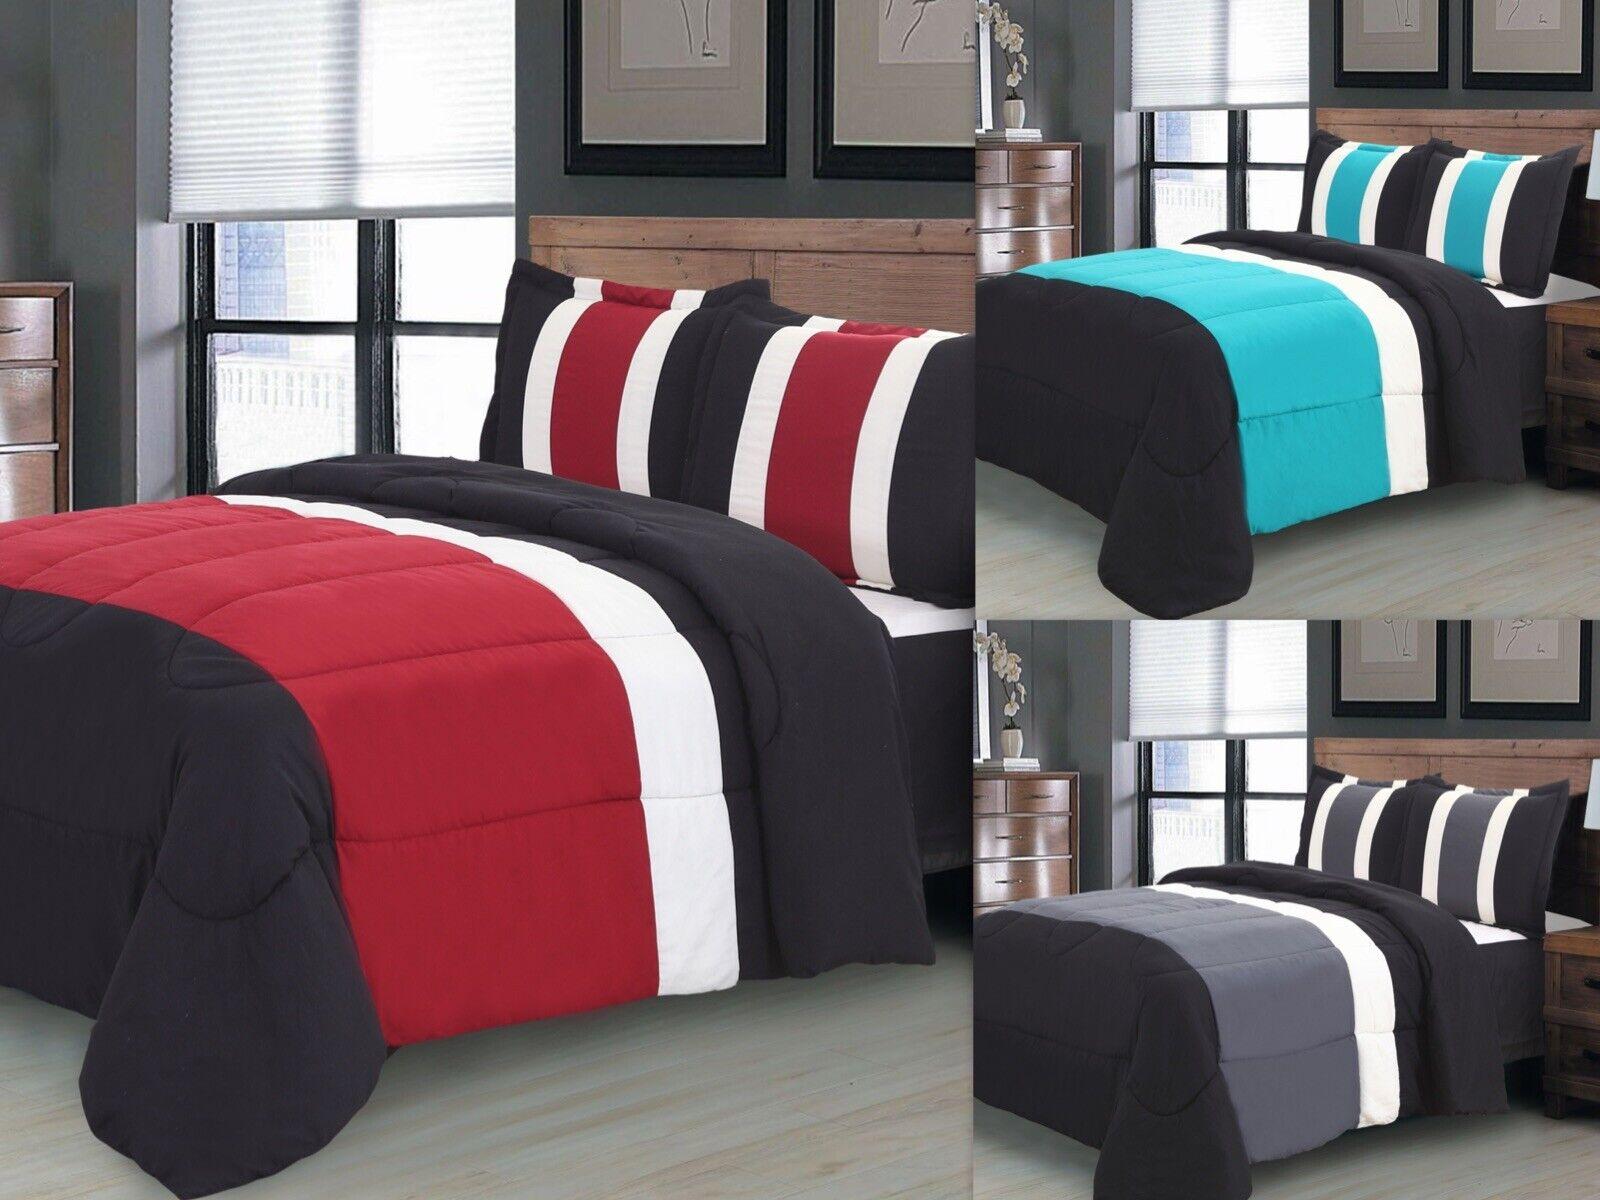 empire home serenity hypoallergenic 4 piece comforter